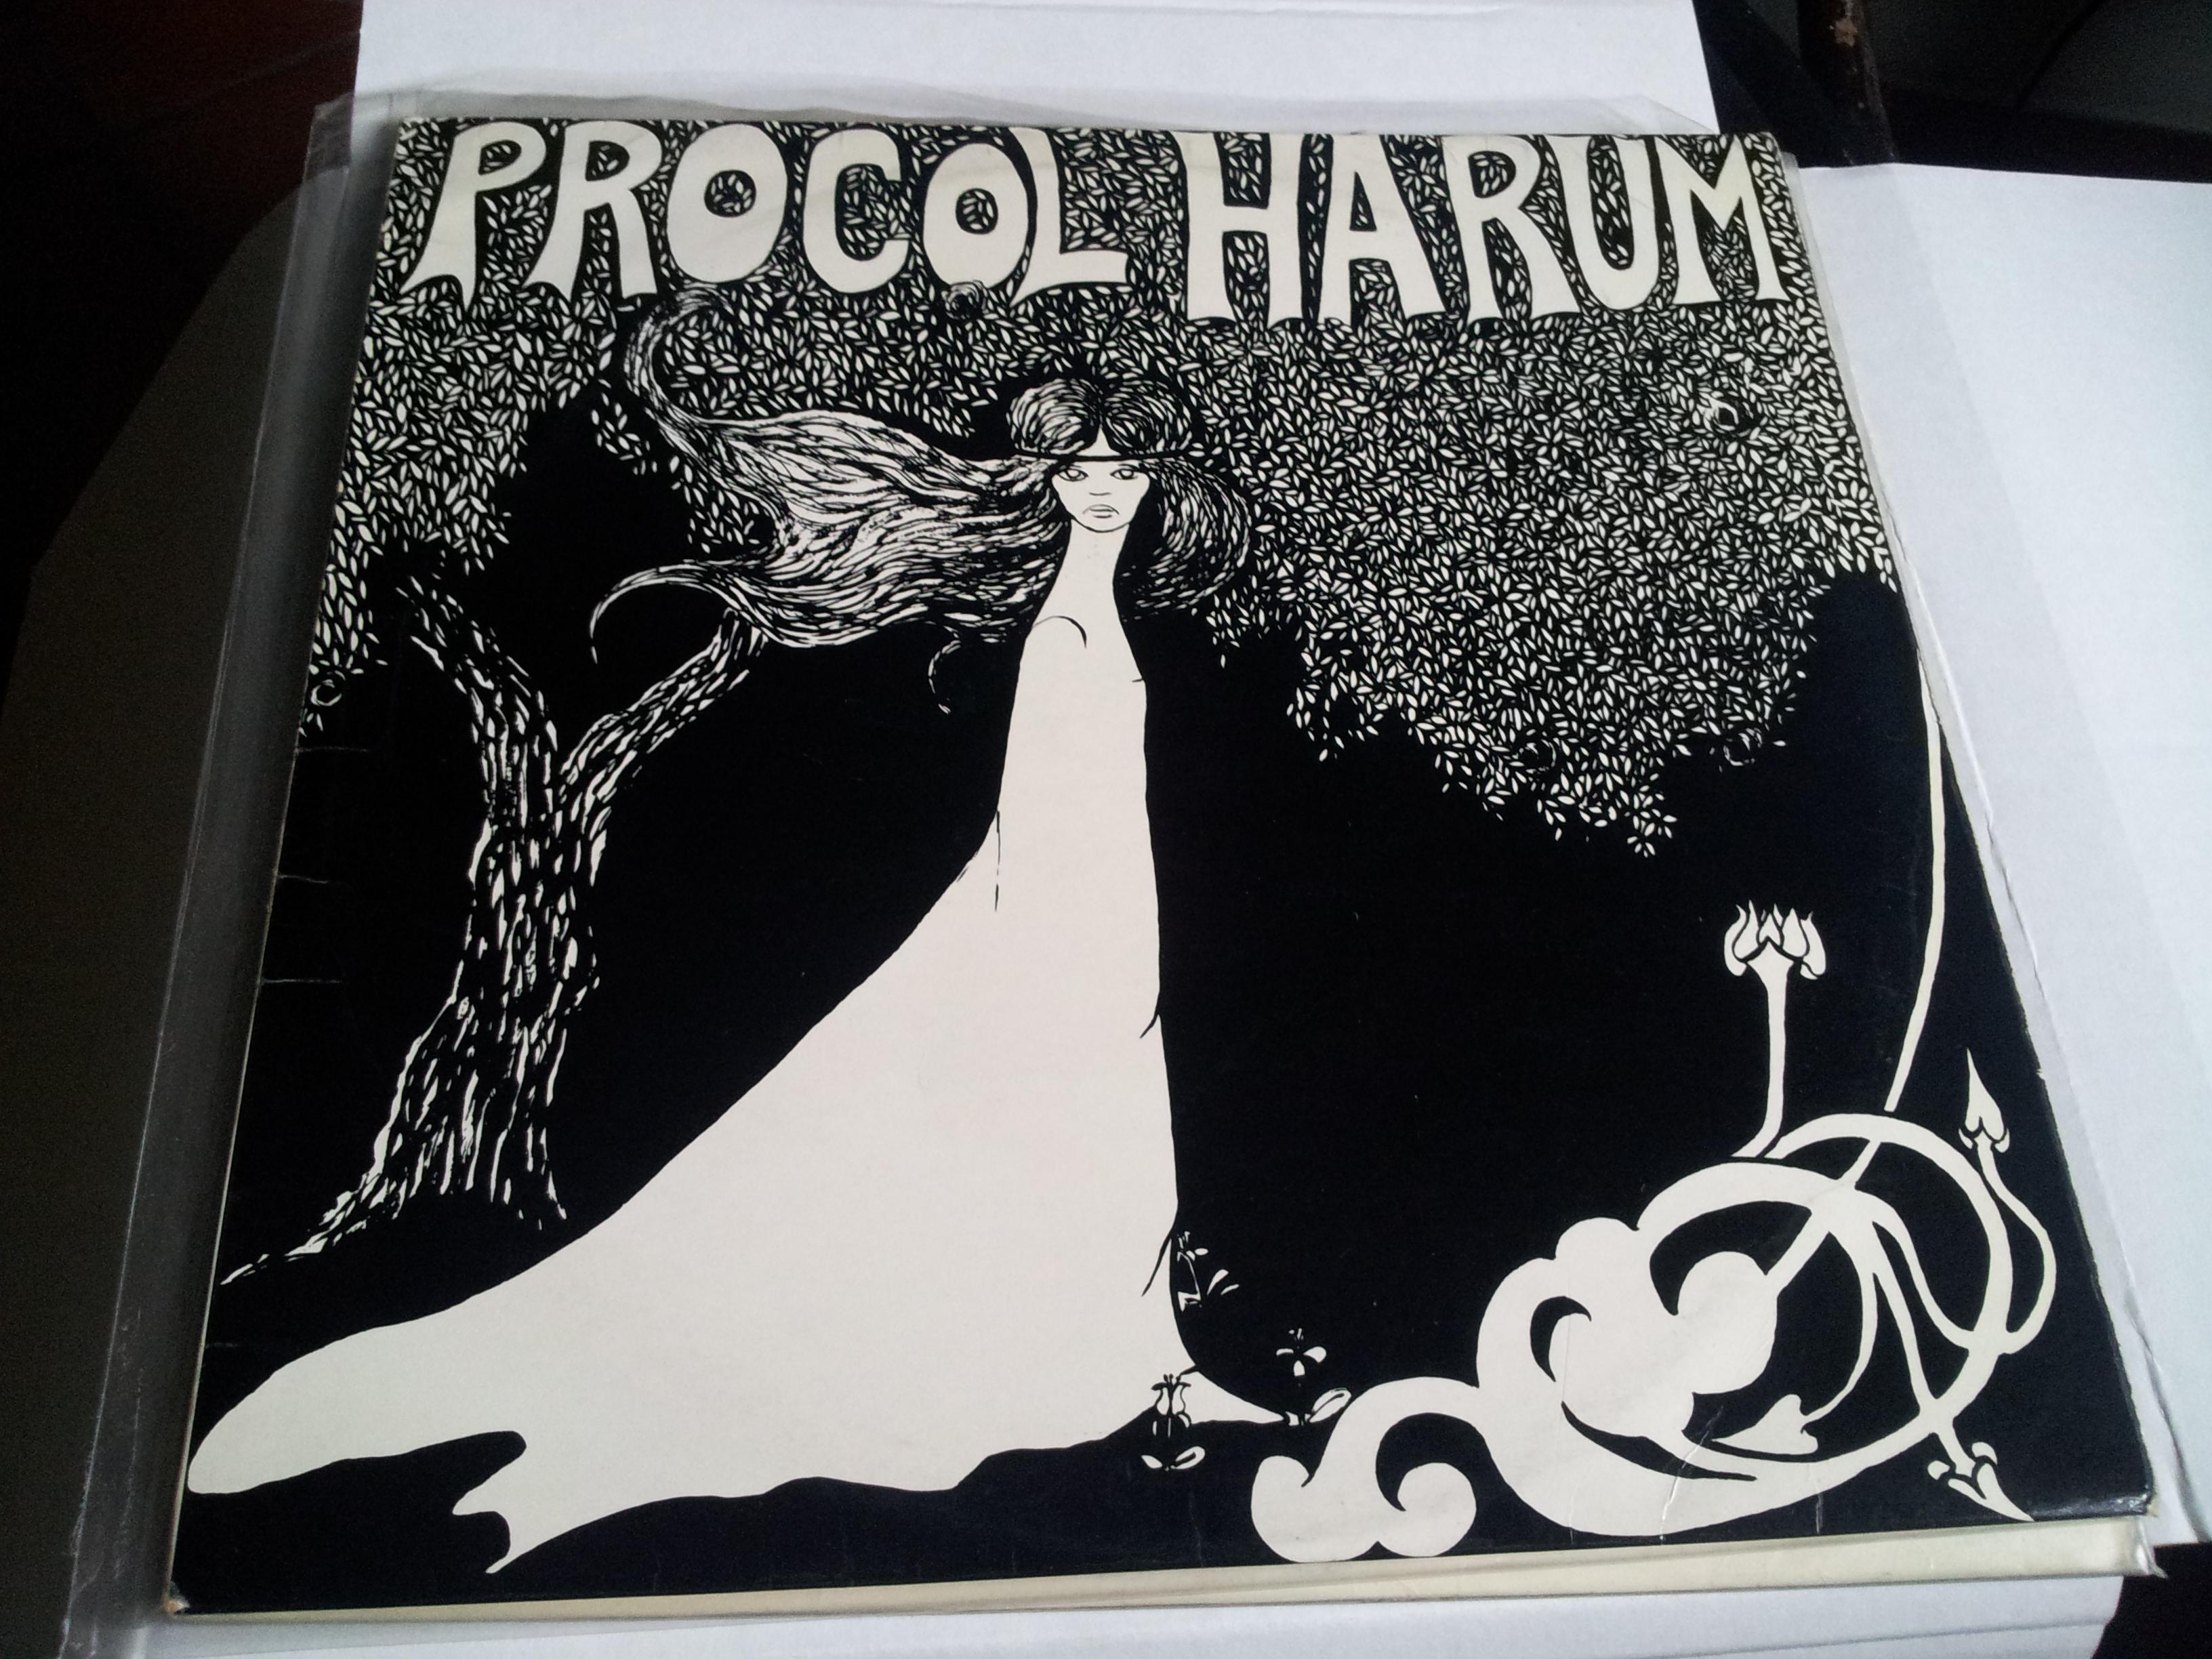 Procol Harum - Procol Harum [vinyl] Procol Harum